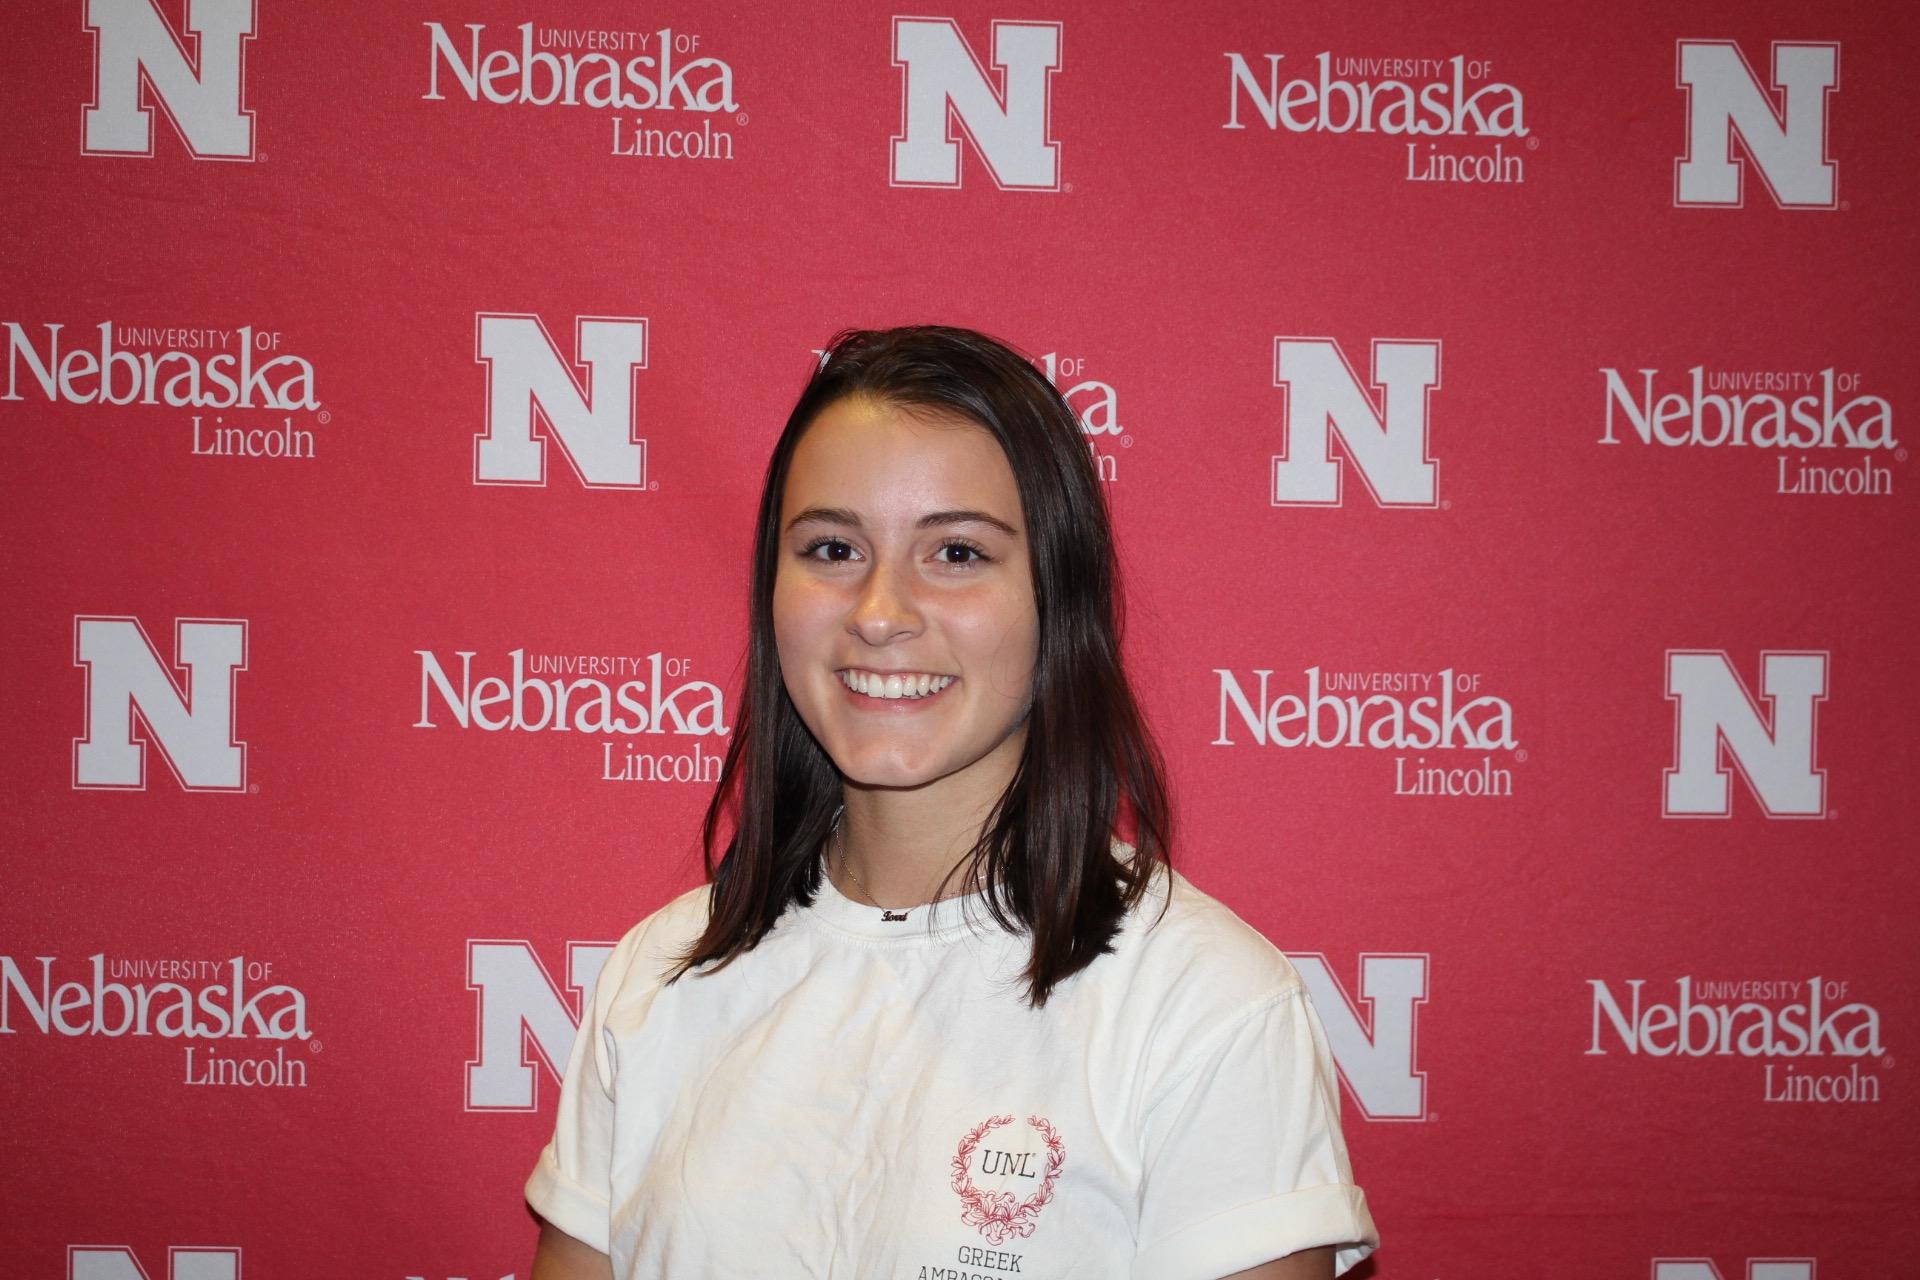 Nebraska Linkedin Jessica Hotovy Wwwmiifotoscom